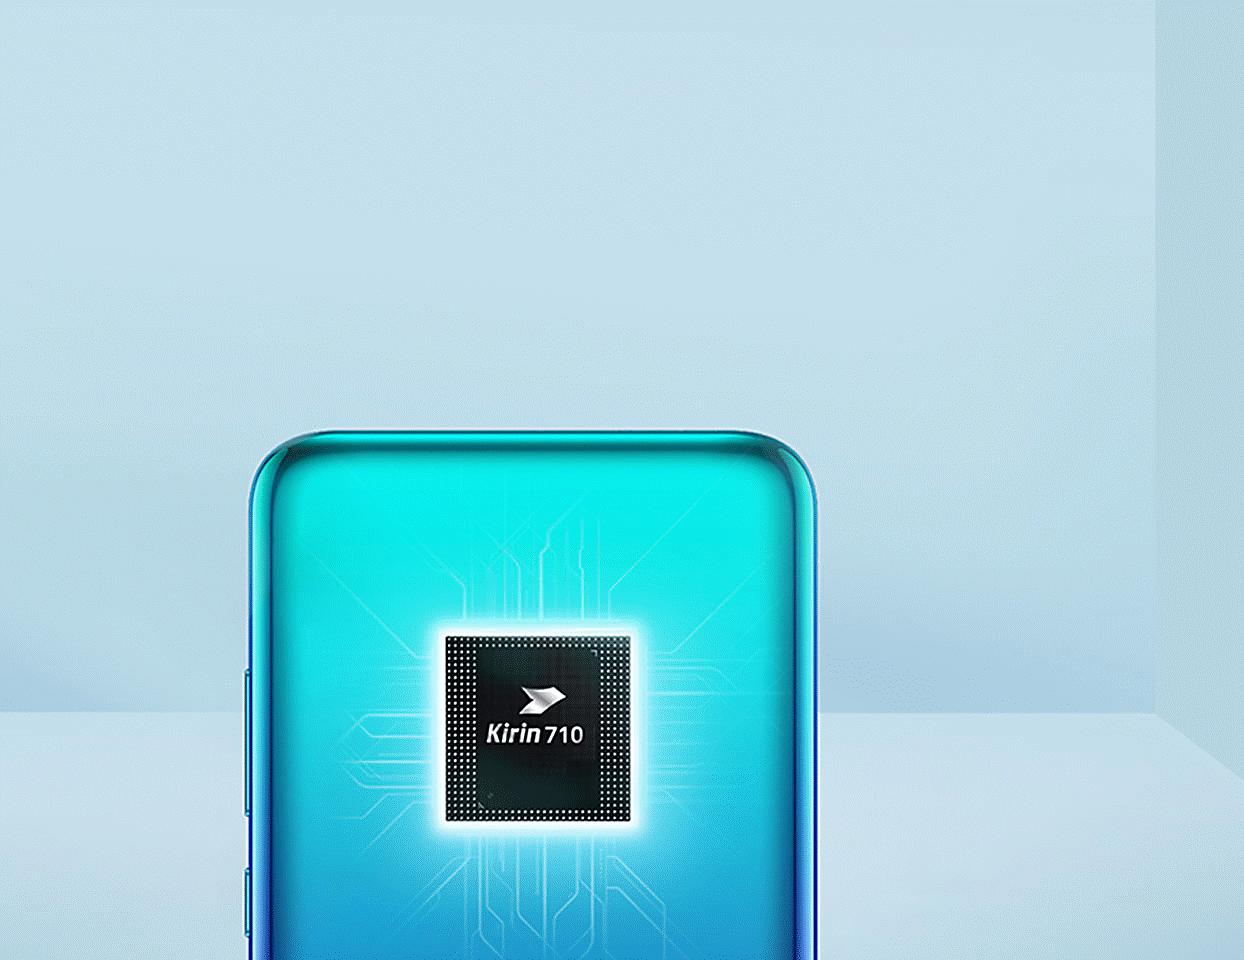 Huawei P Smart 2019 Deals - Contract, Upgrade, Sim Free & Unlocked